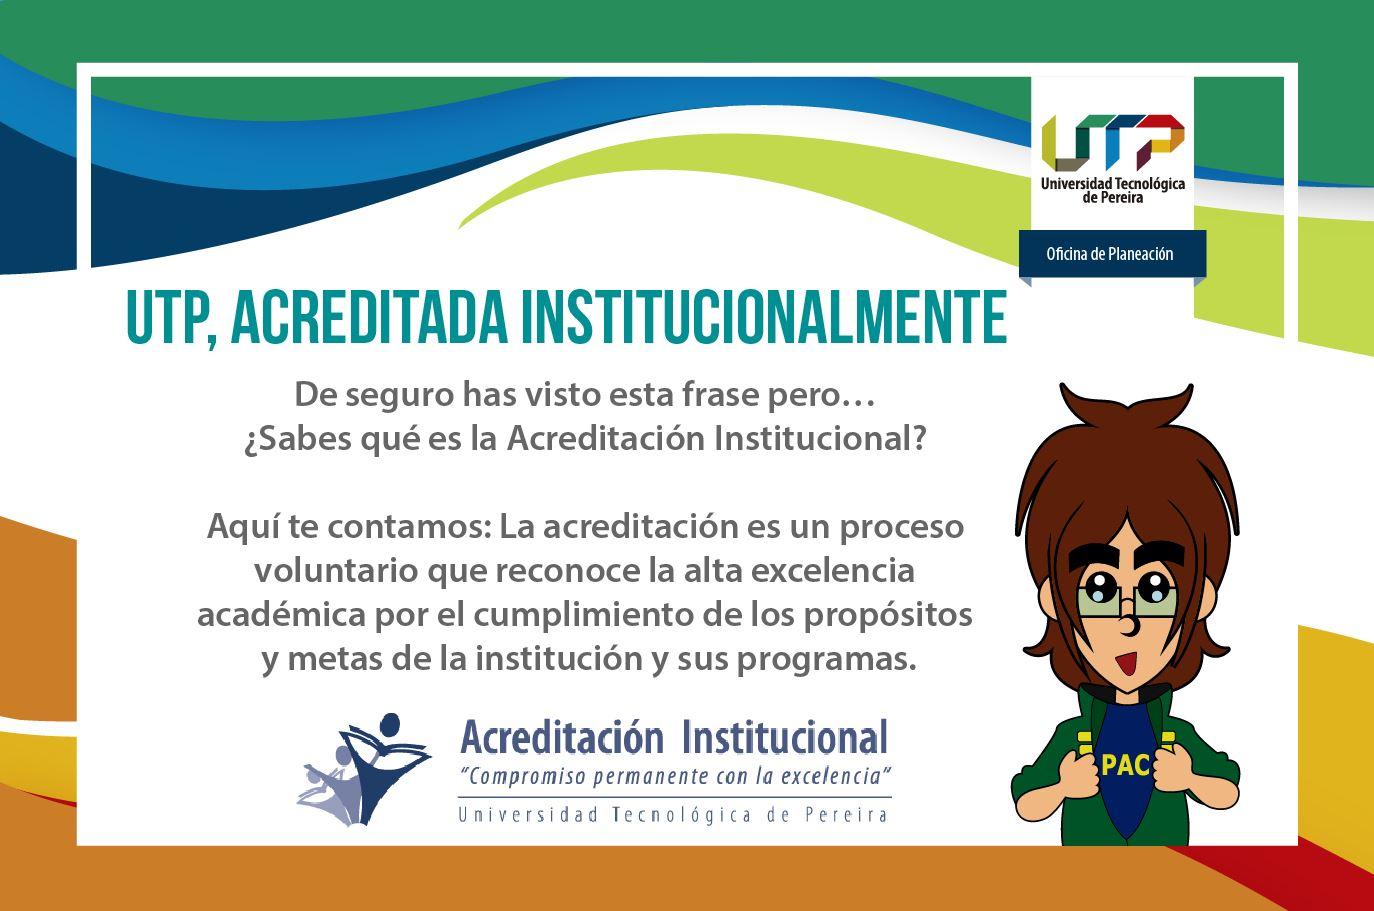 UTP, Acreditada Institucionalmente